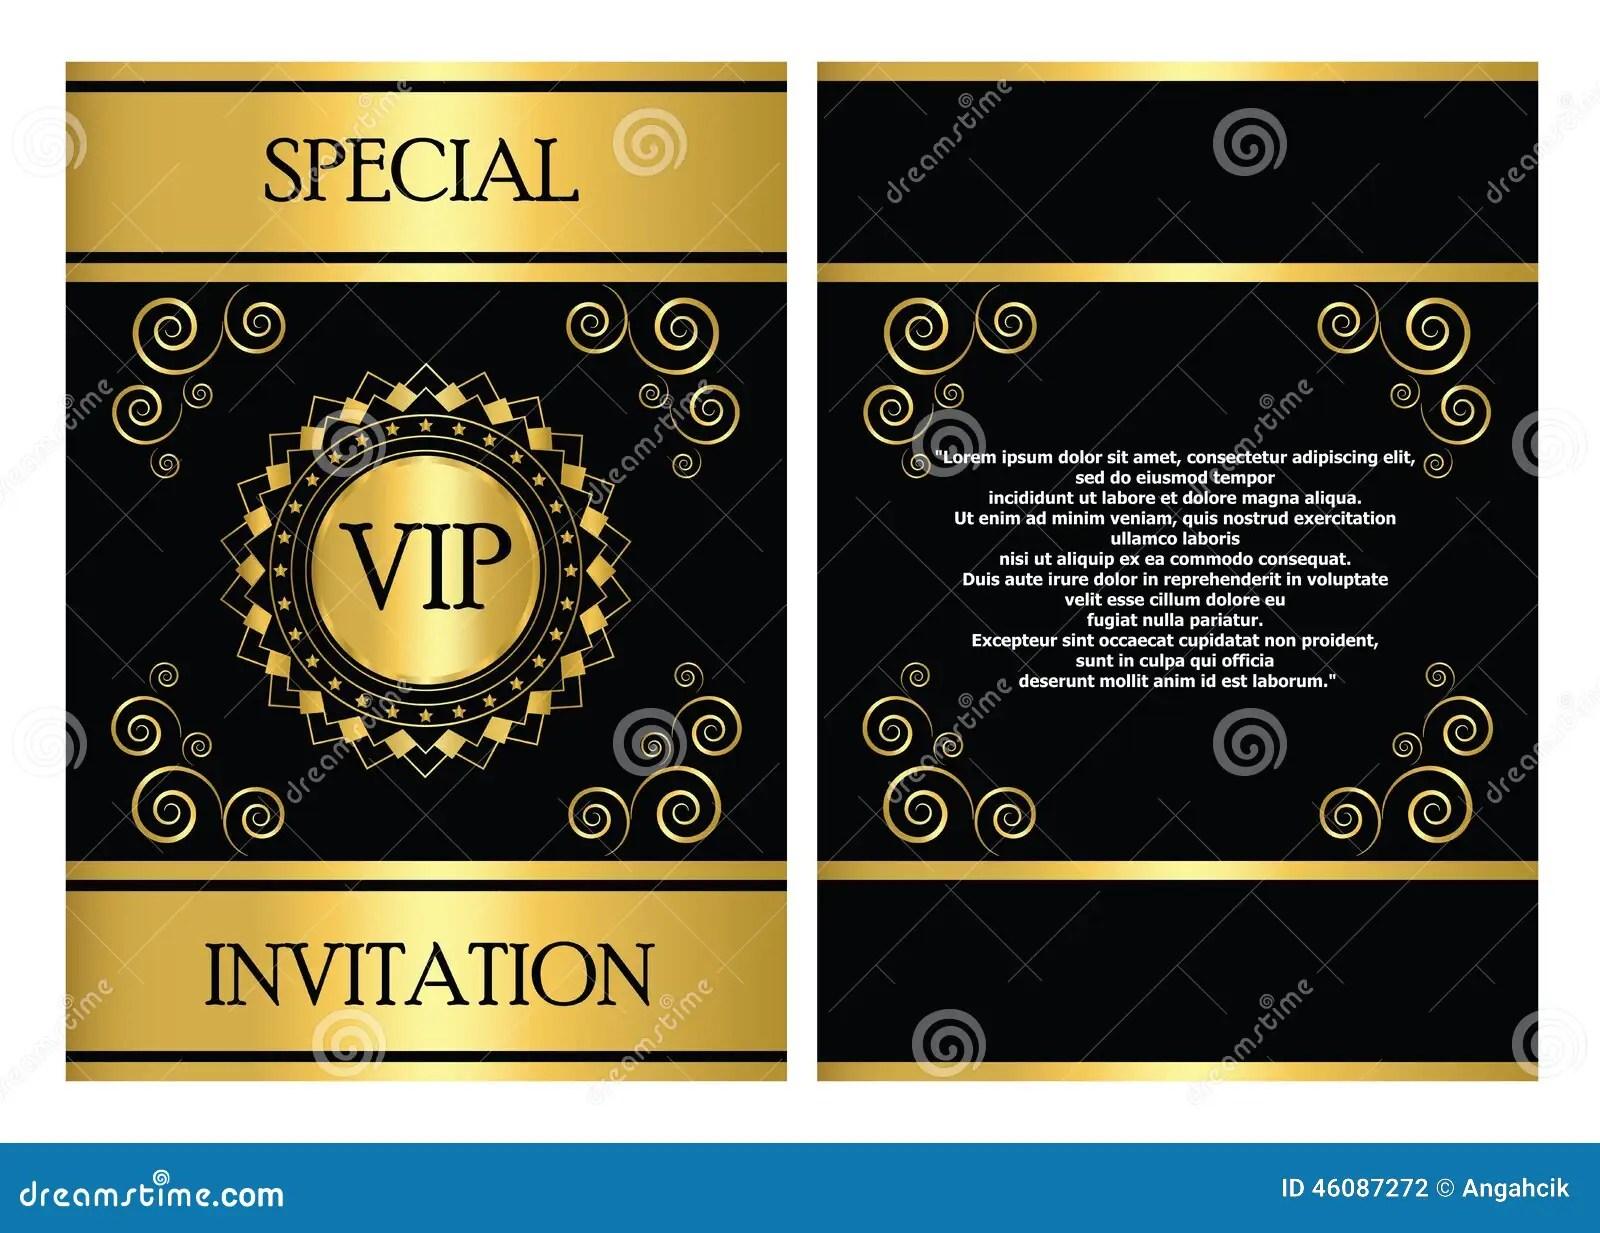 Free Vip Invitations Template